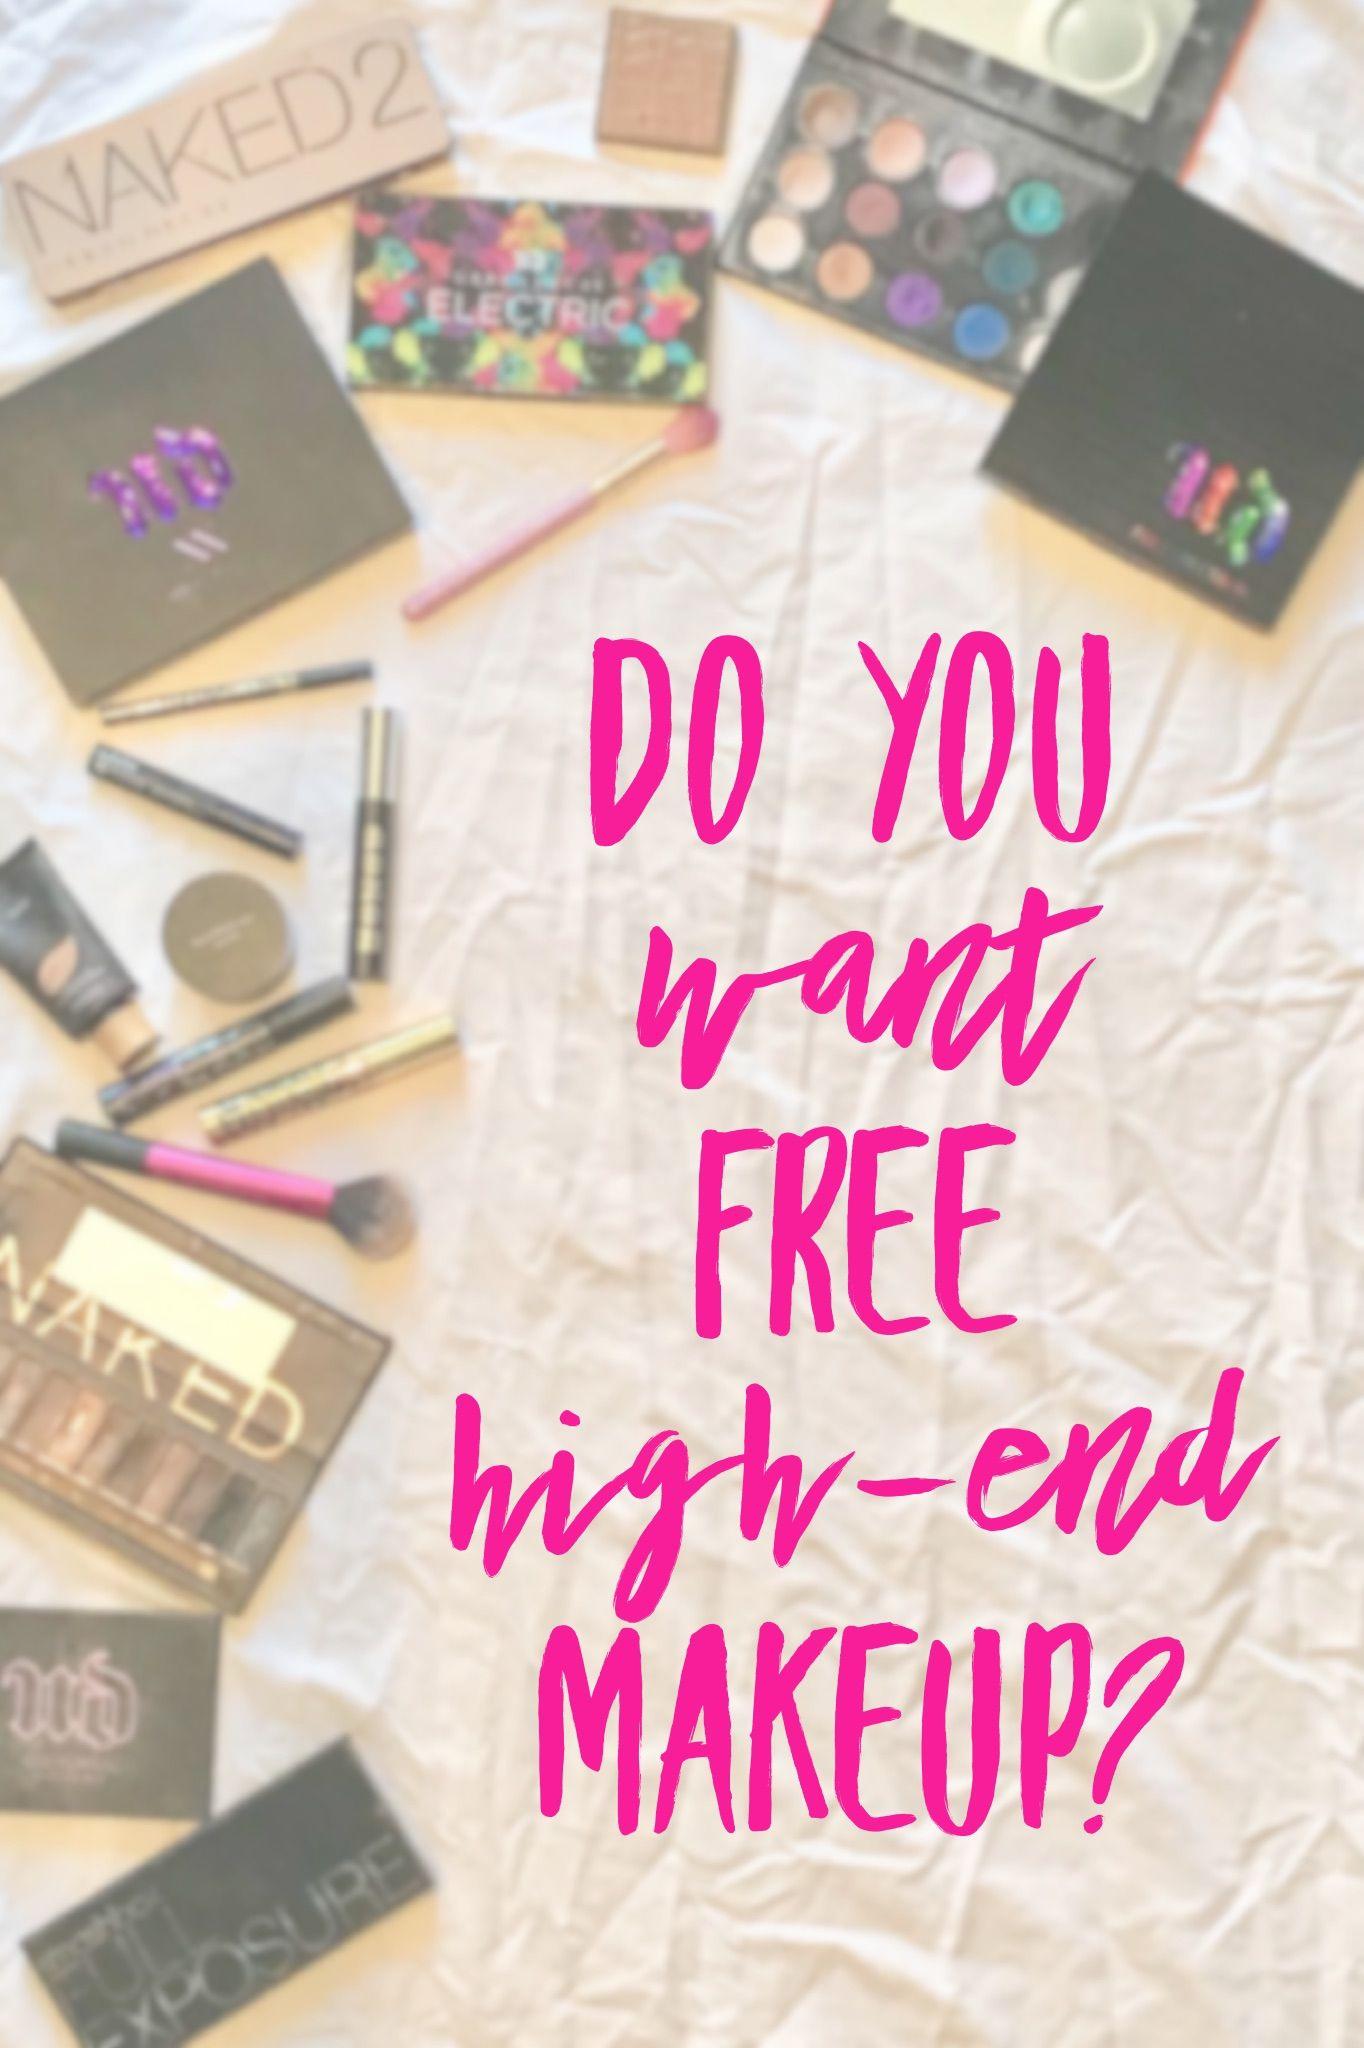 6 Legitimate Ways to Get Free HighEnd Makeup High end